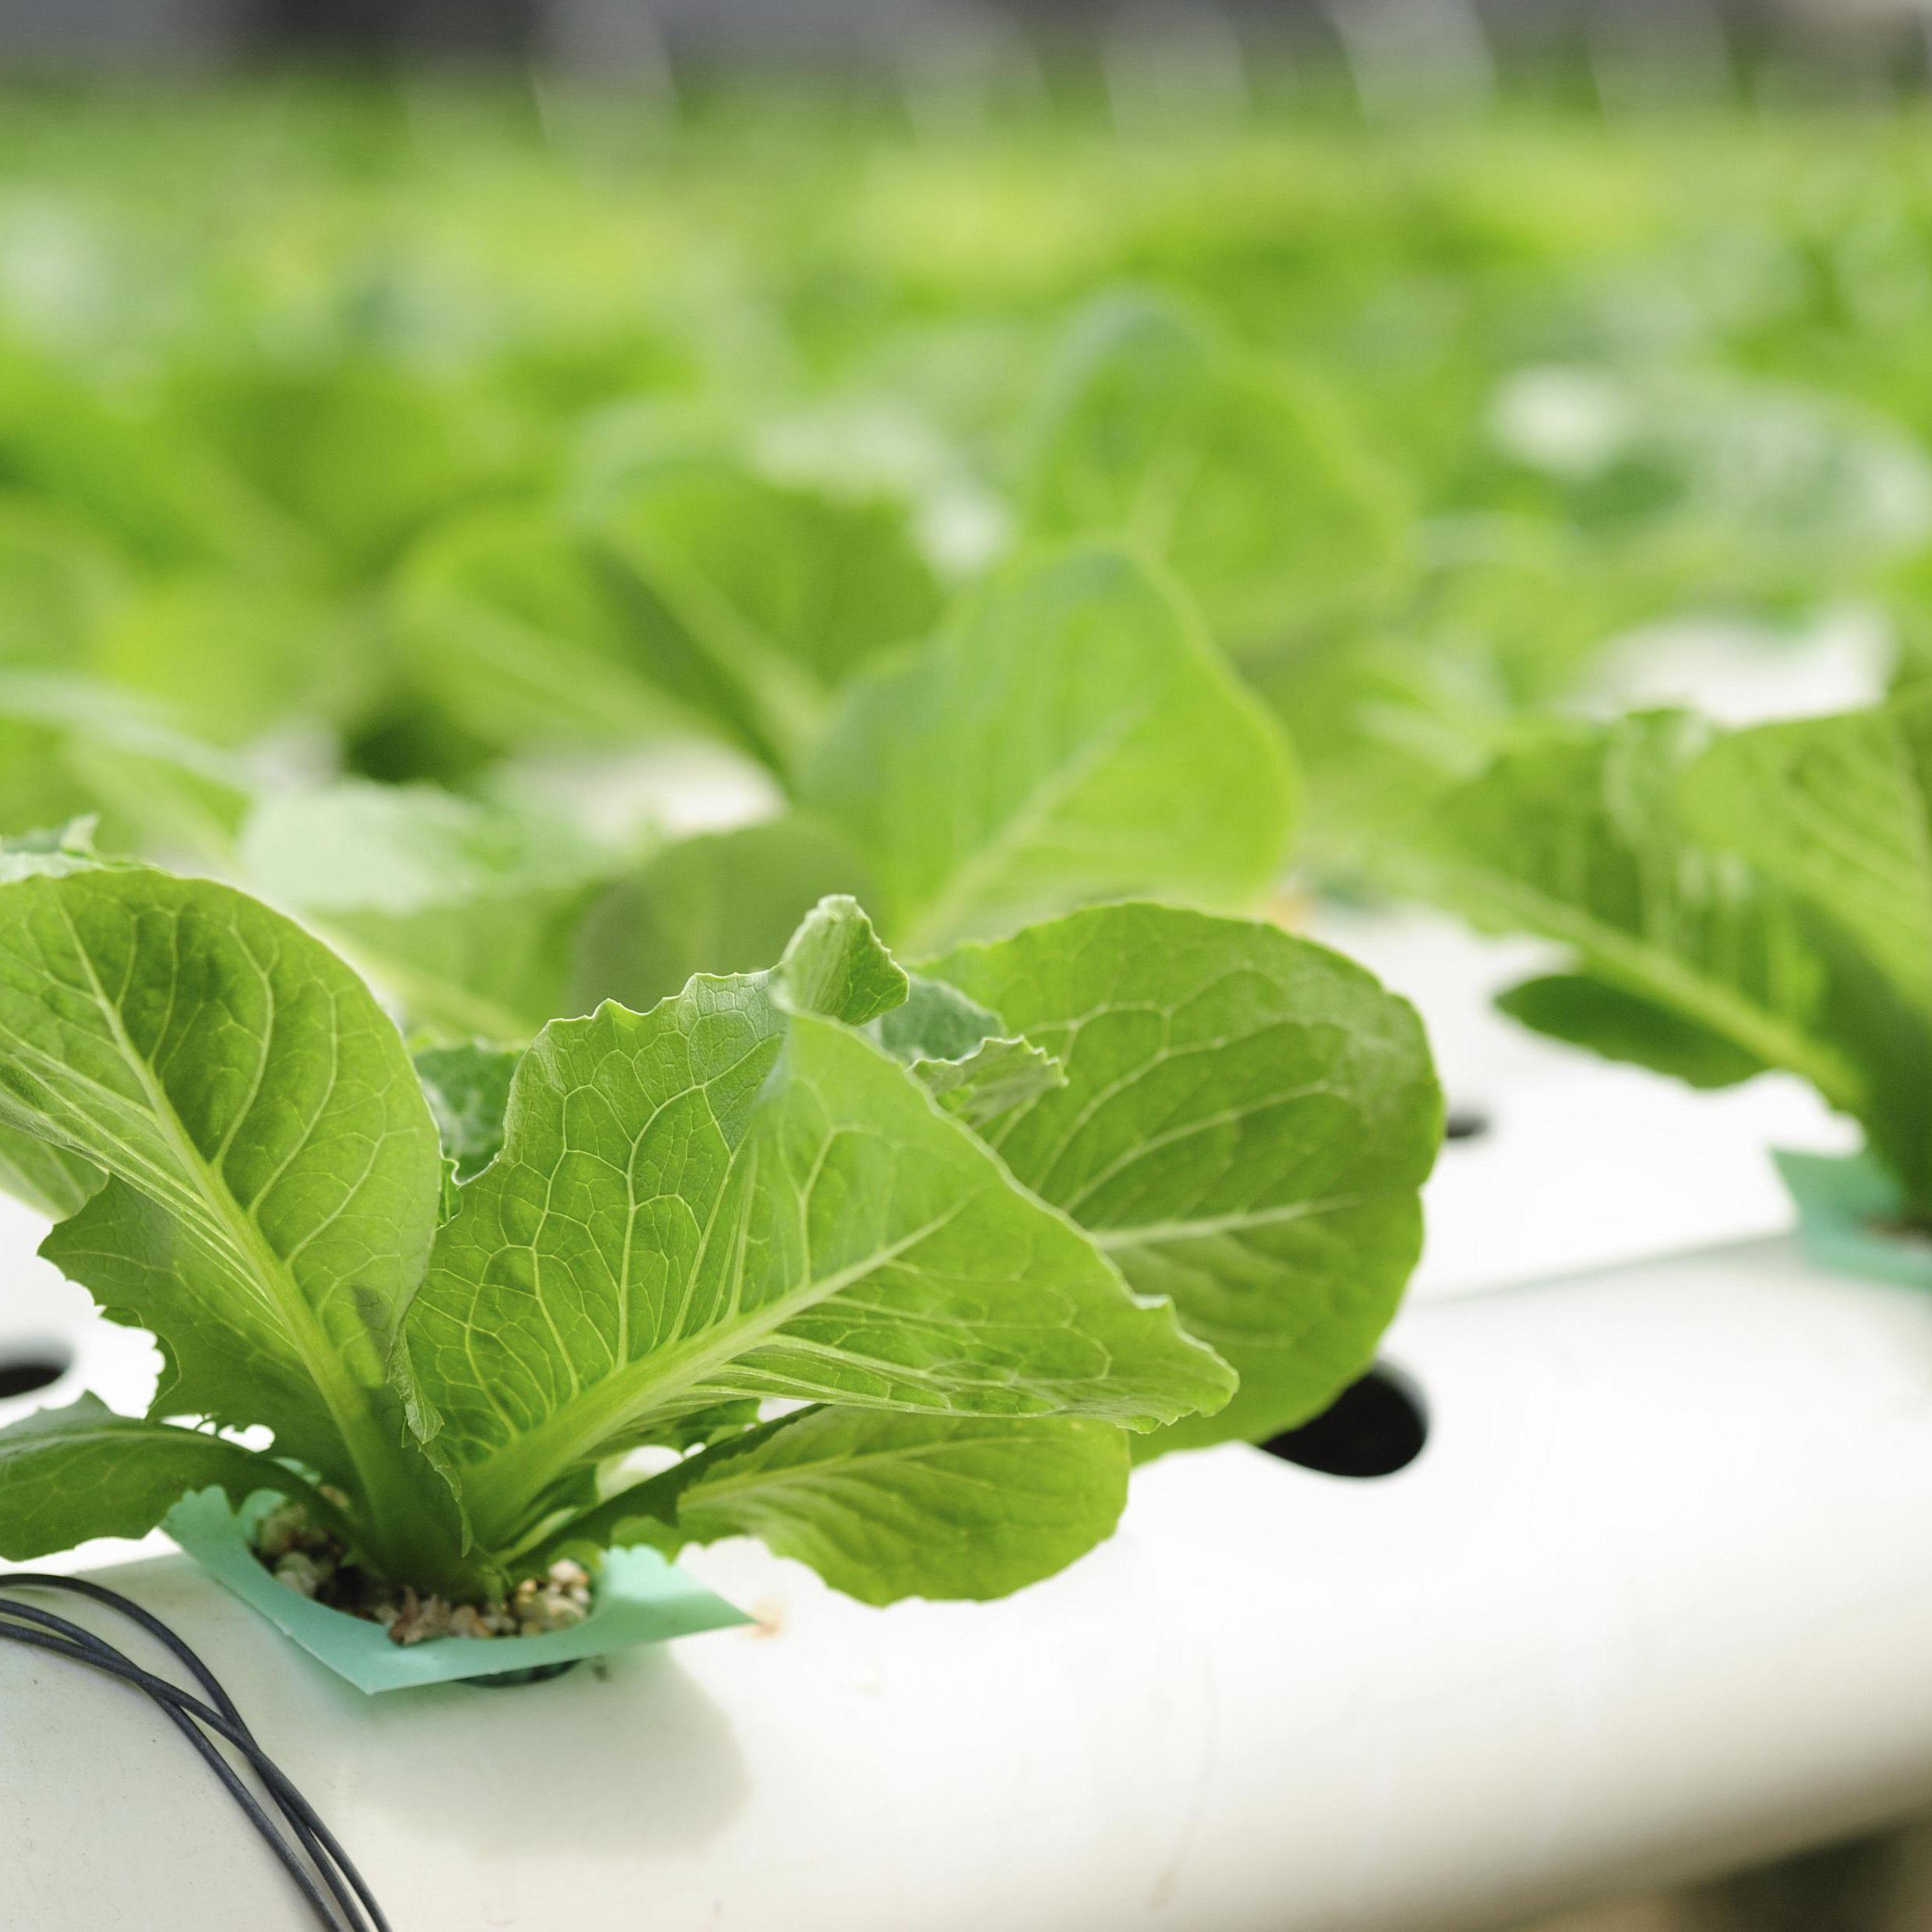 Hydroponic Nutrient Solution Basics